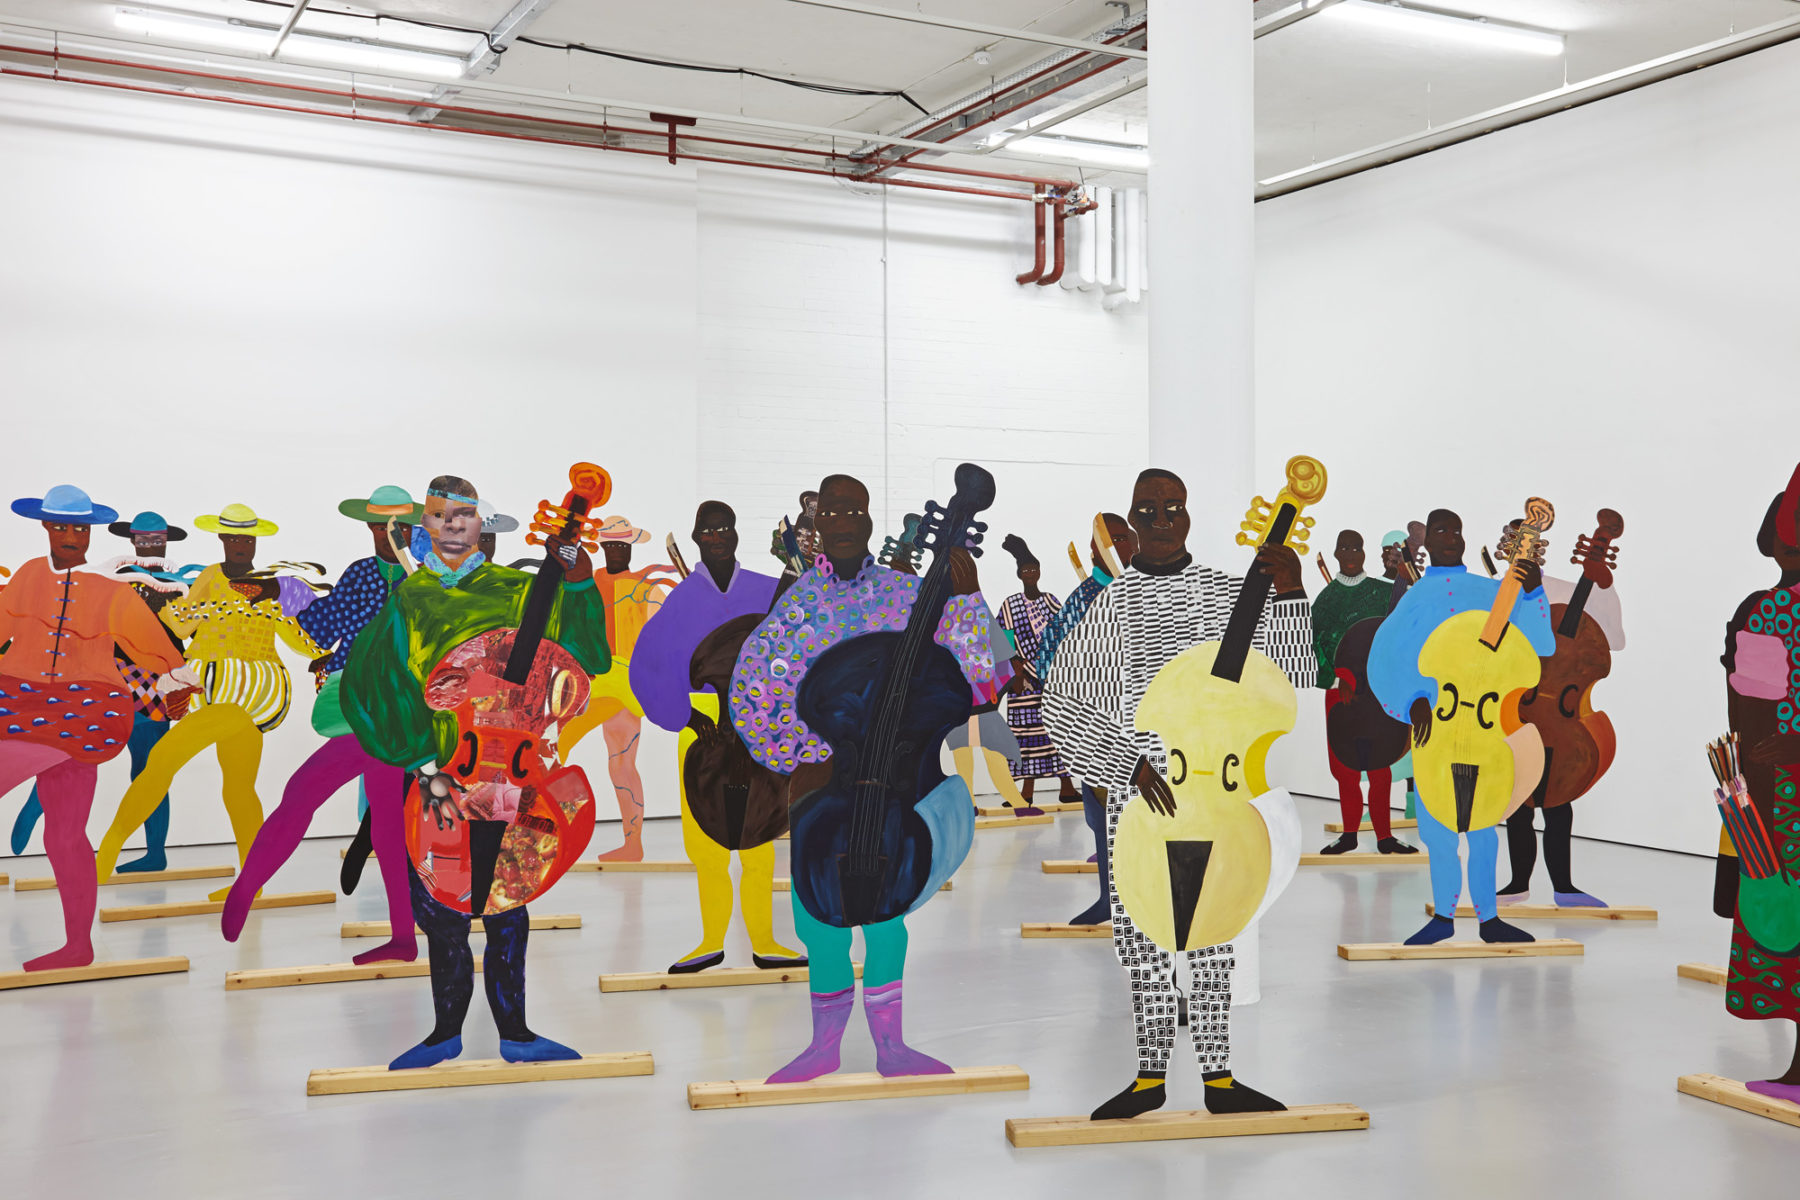 CAPC Museum of Contemporary Art of Bordeaux - Walker Art Gallery